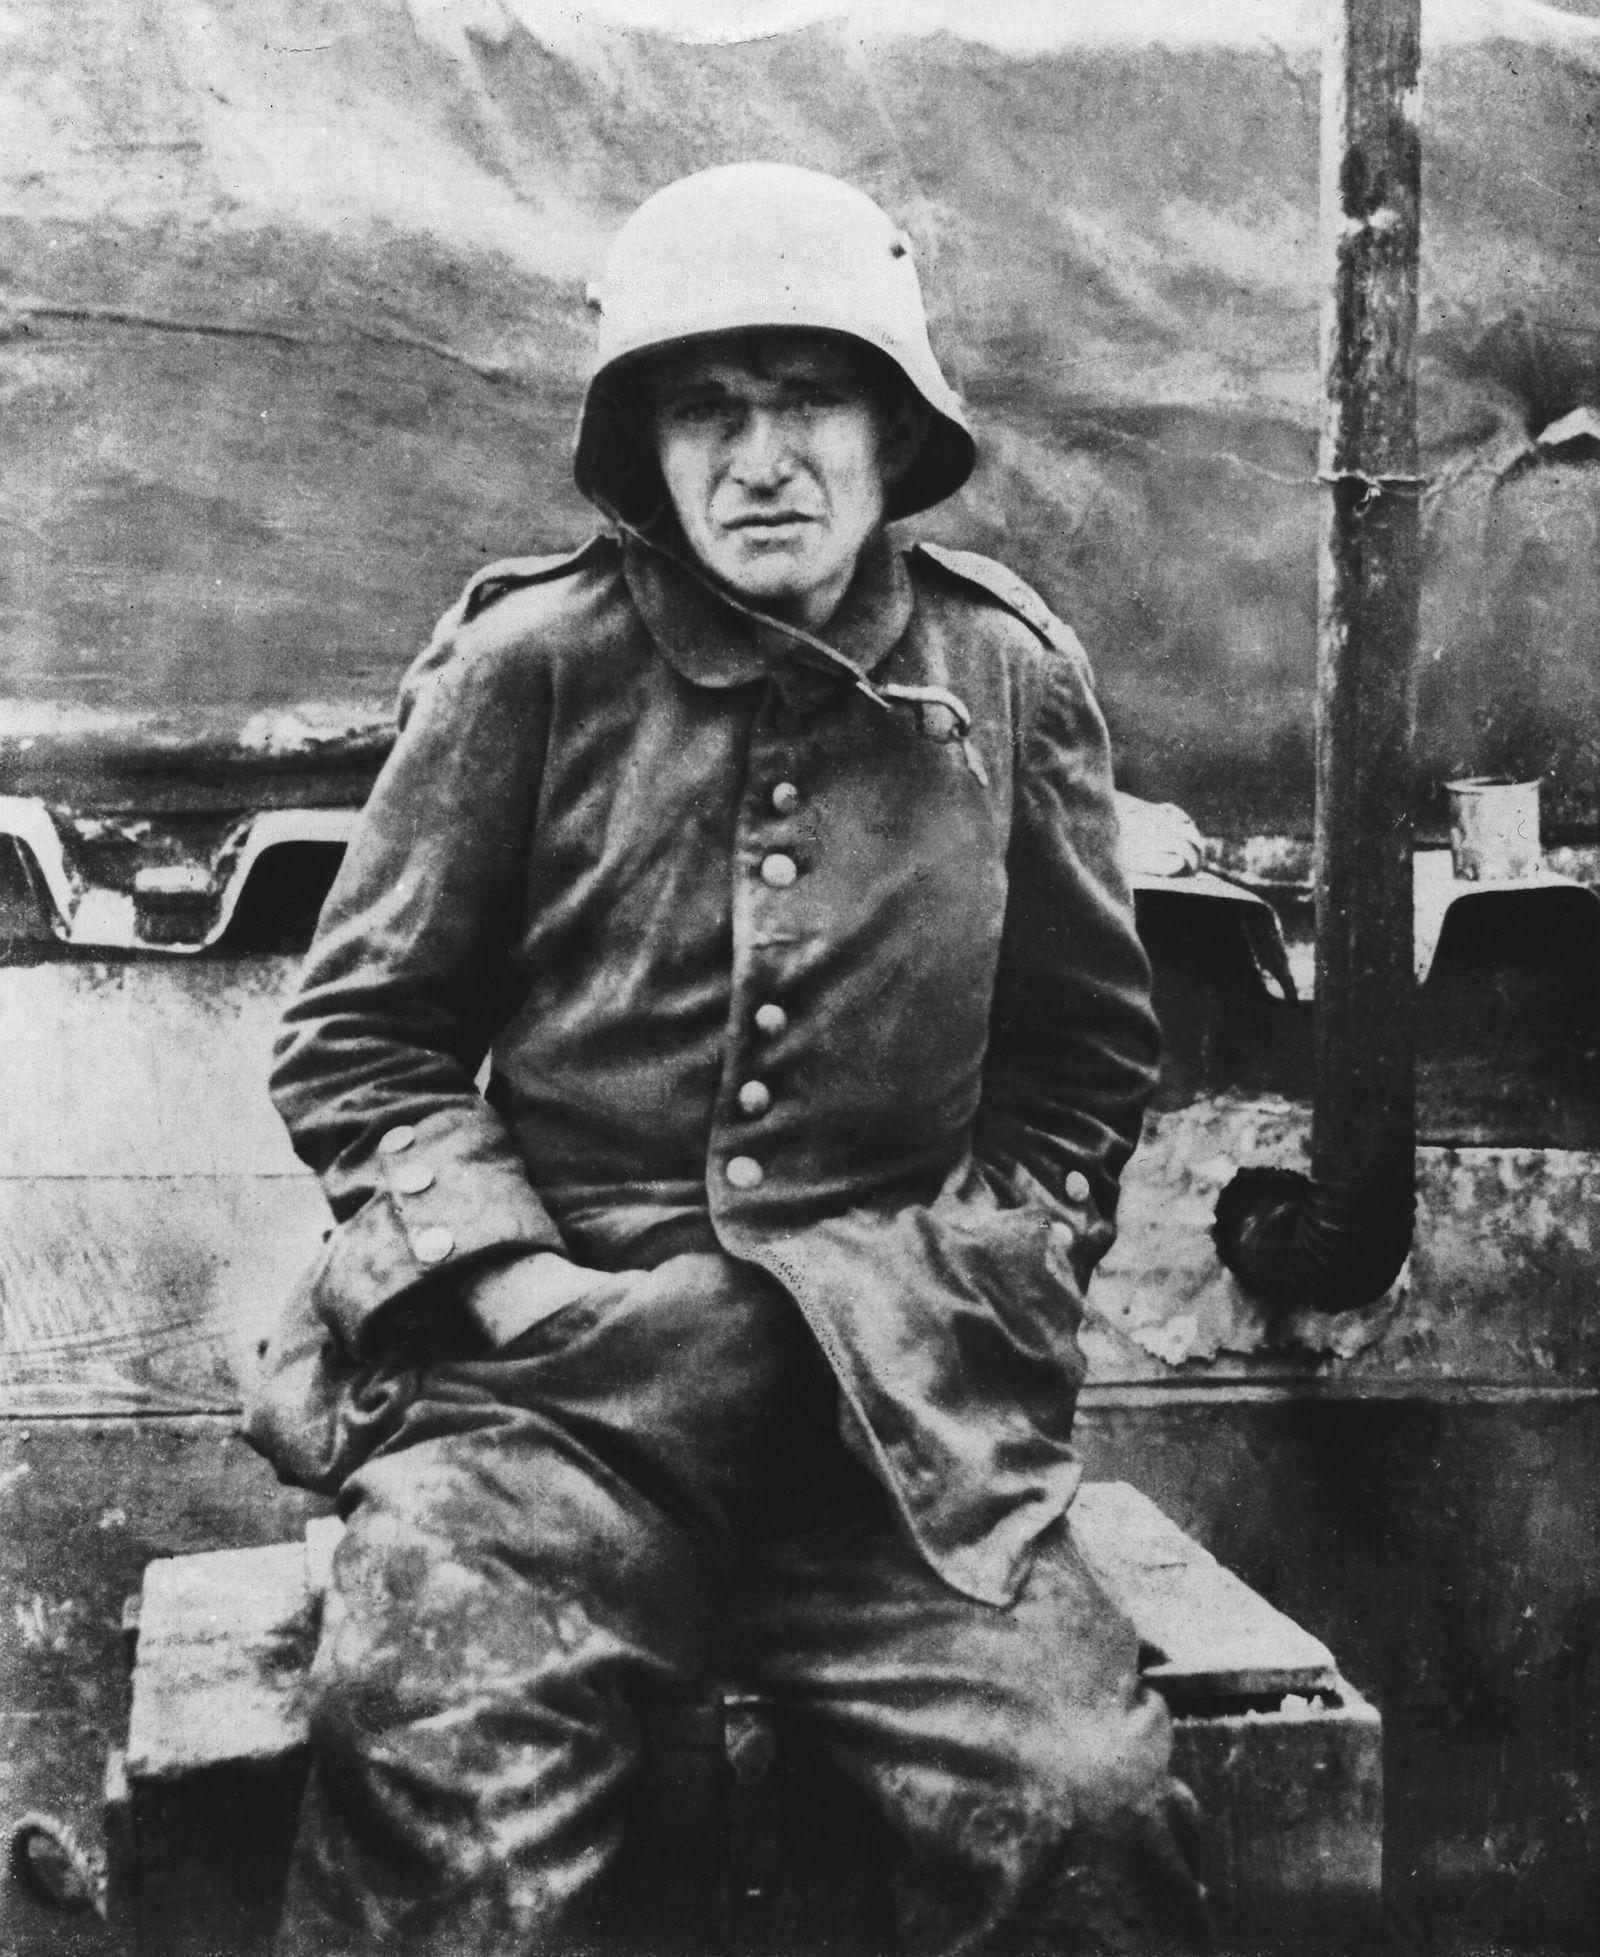 Kriegszitterer - 1.WK, D: Soldaten-Portraet: Soldat, erschoepft 1918